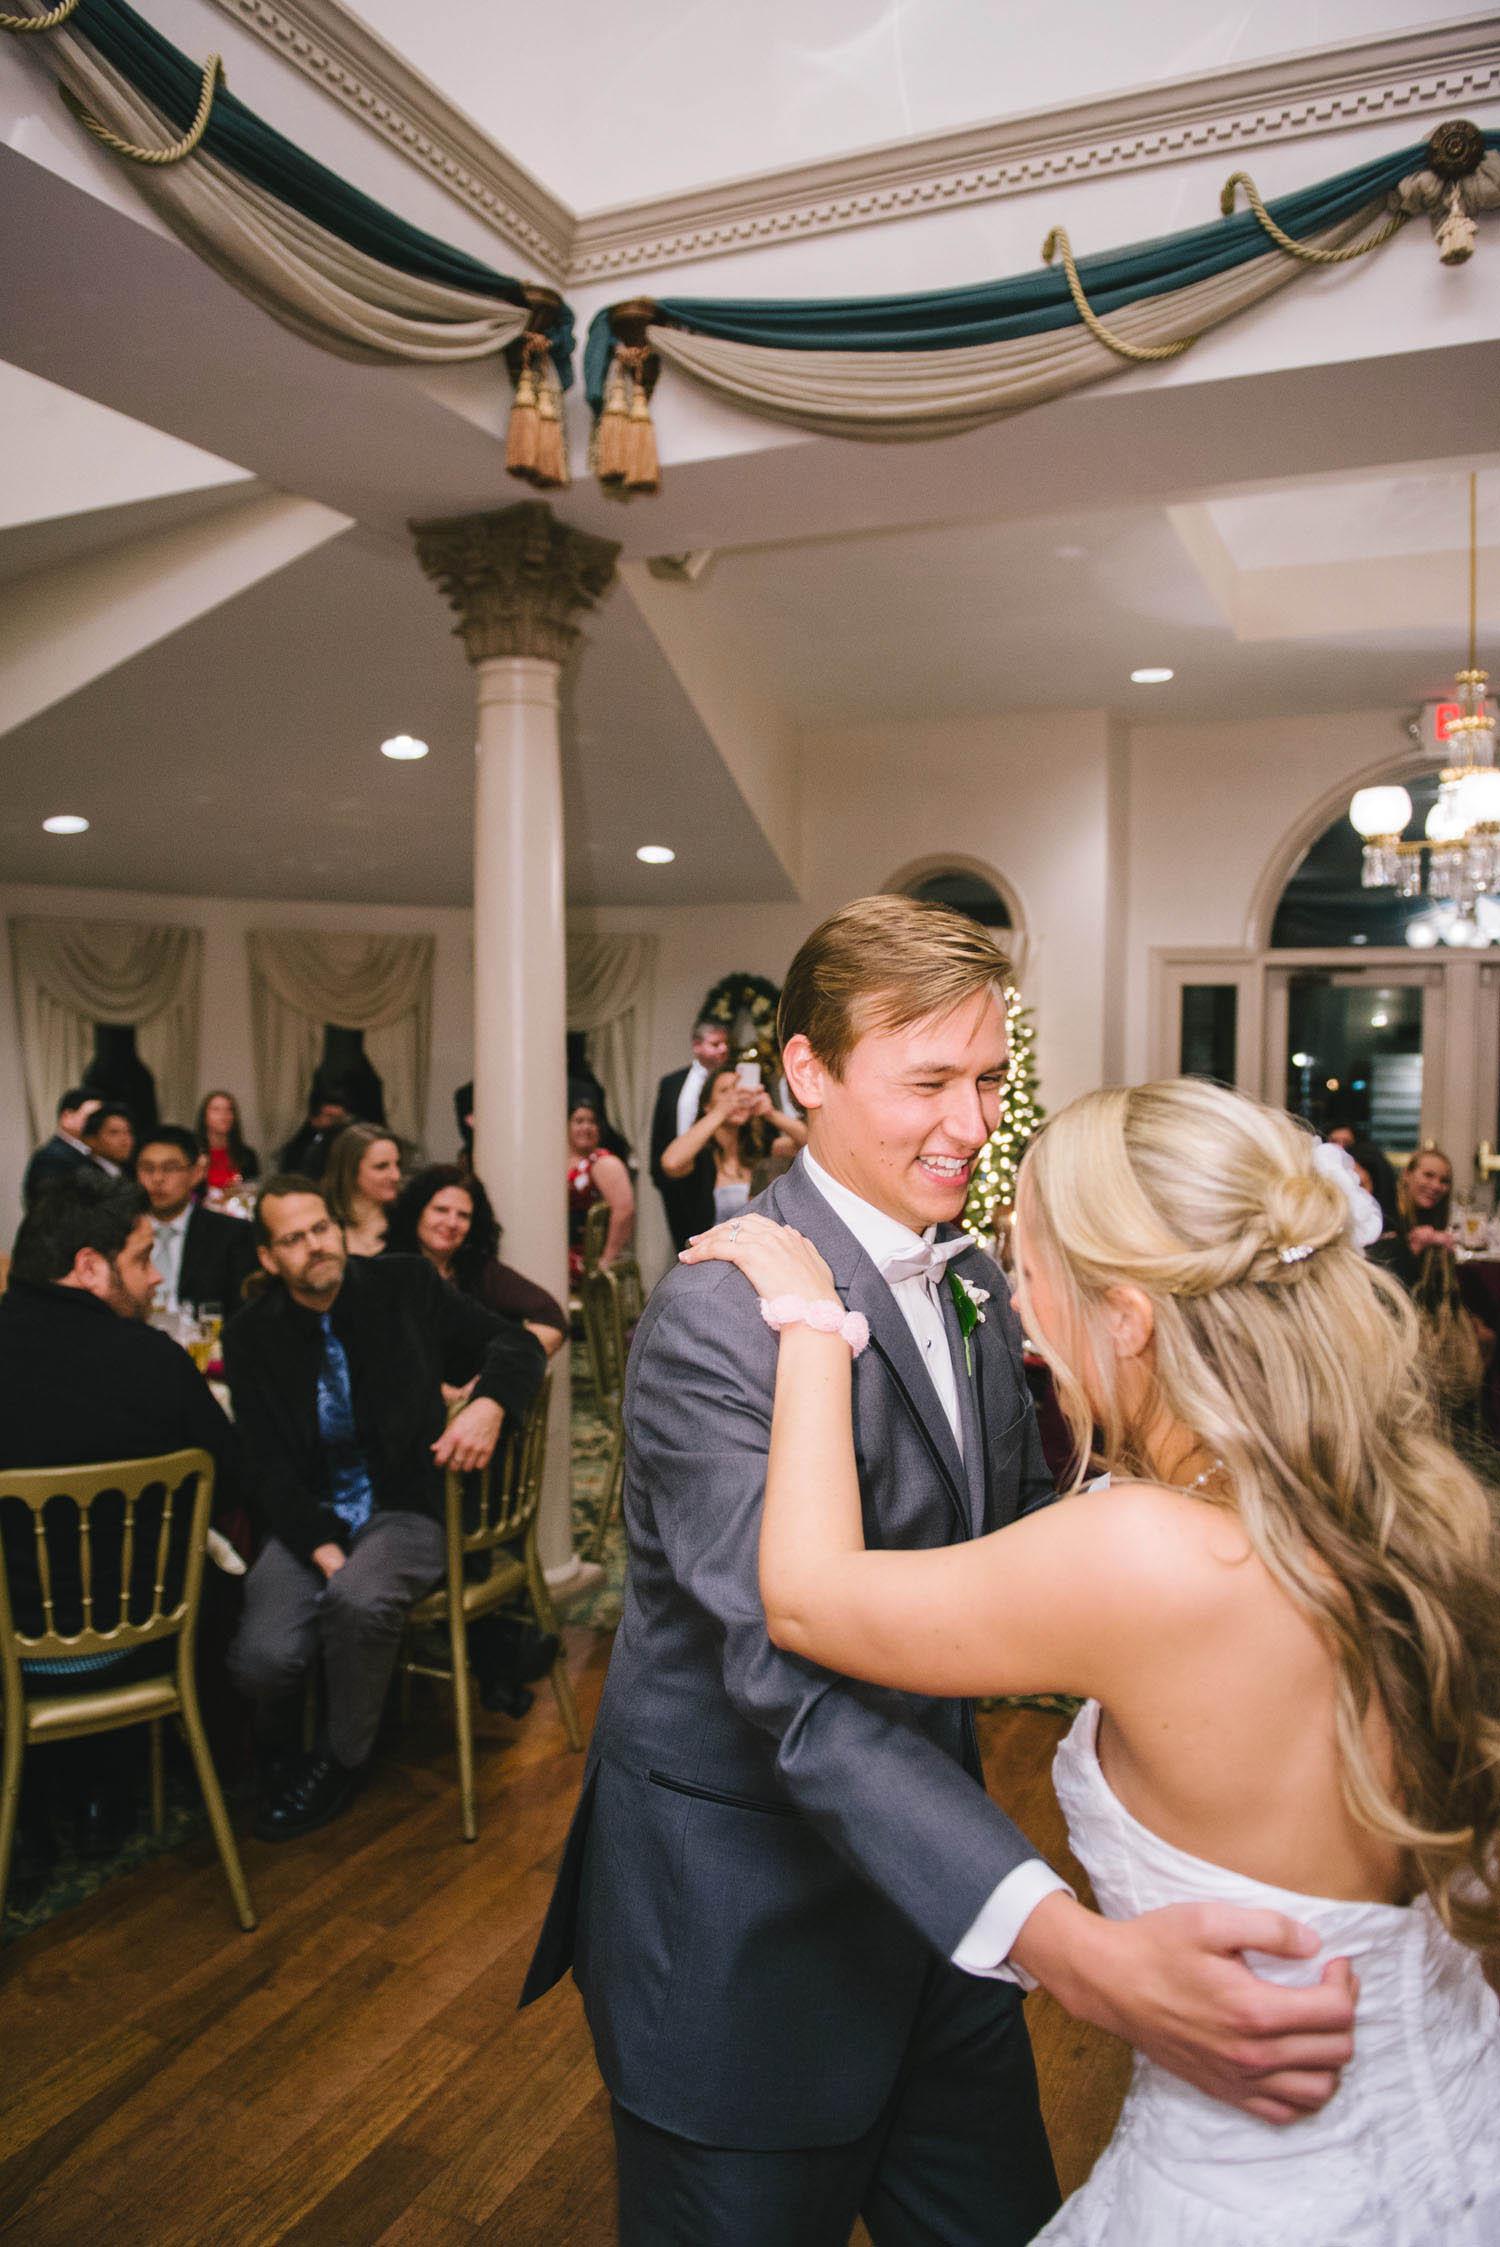 youngstrom-wedding-131.jpg